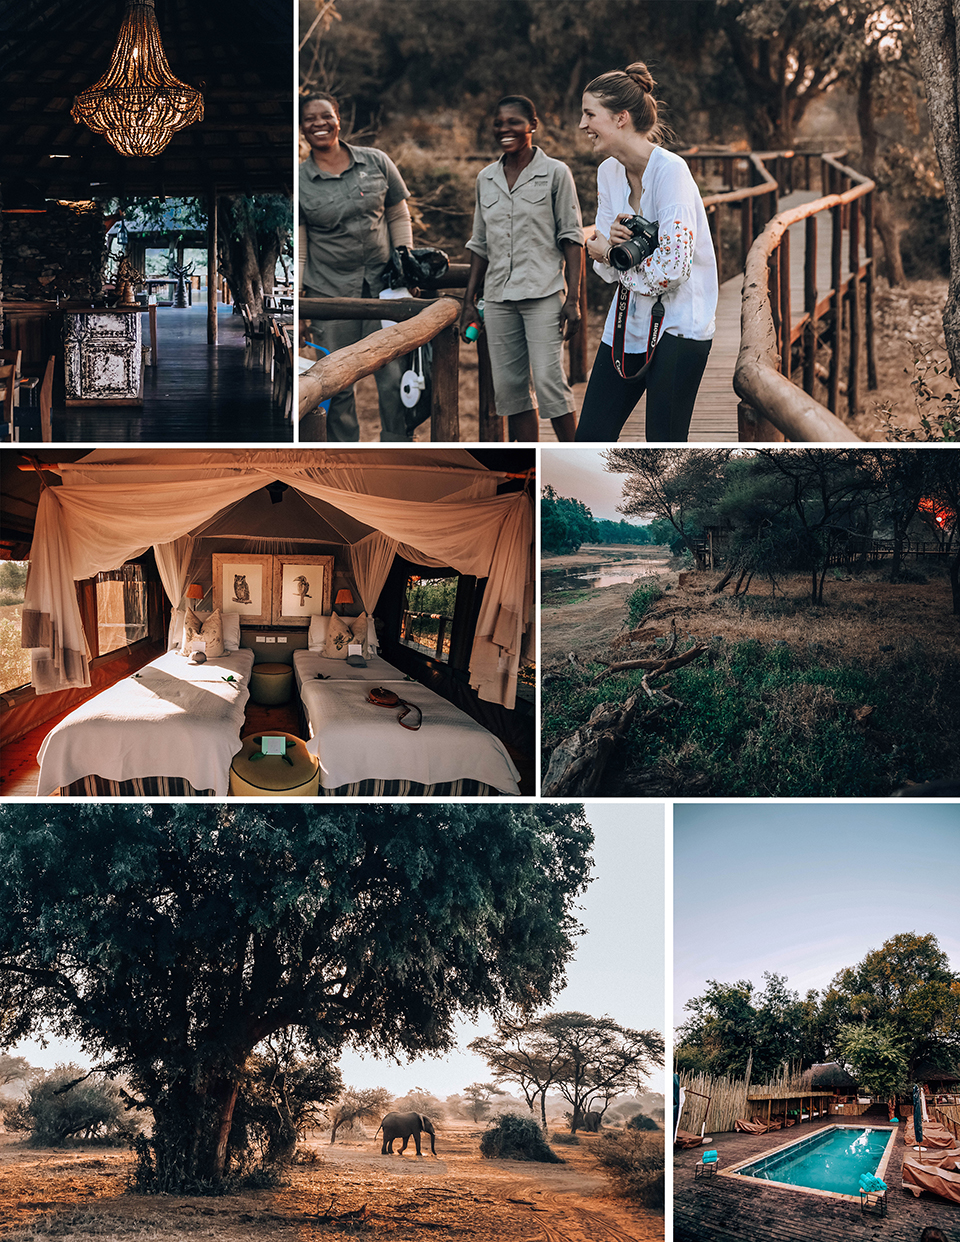 pafuri-camp-02.jpg